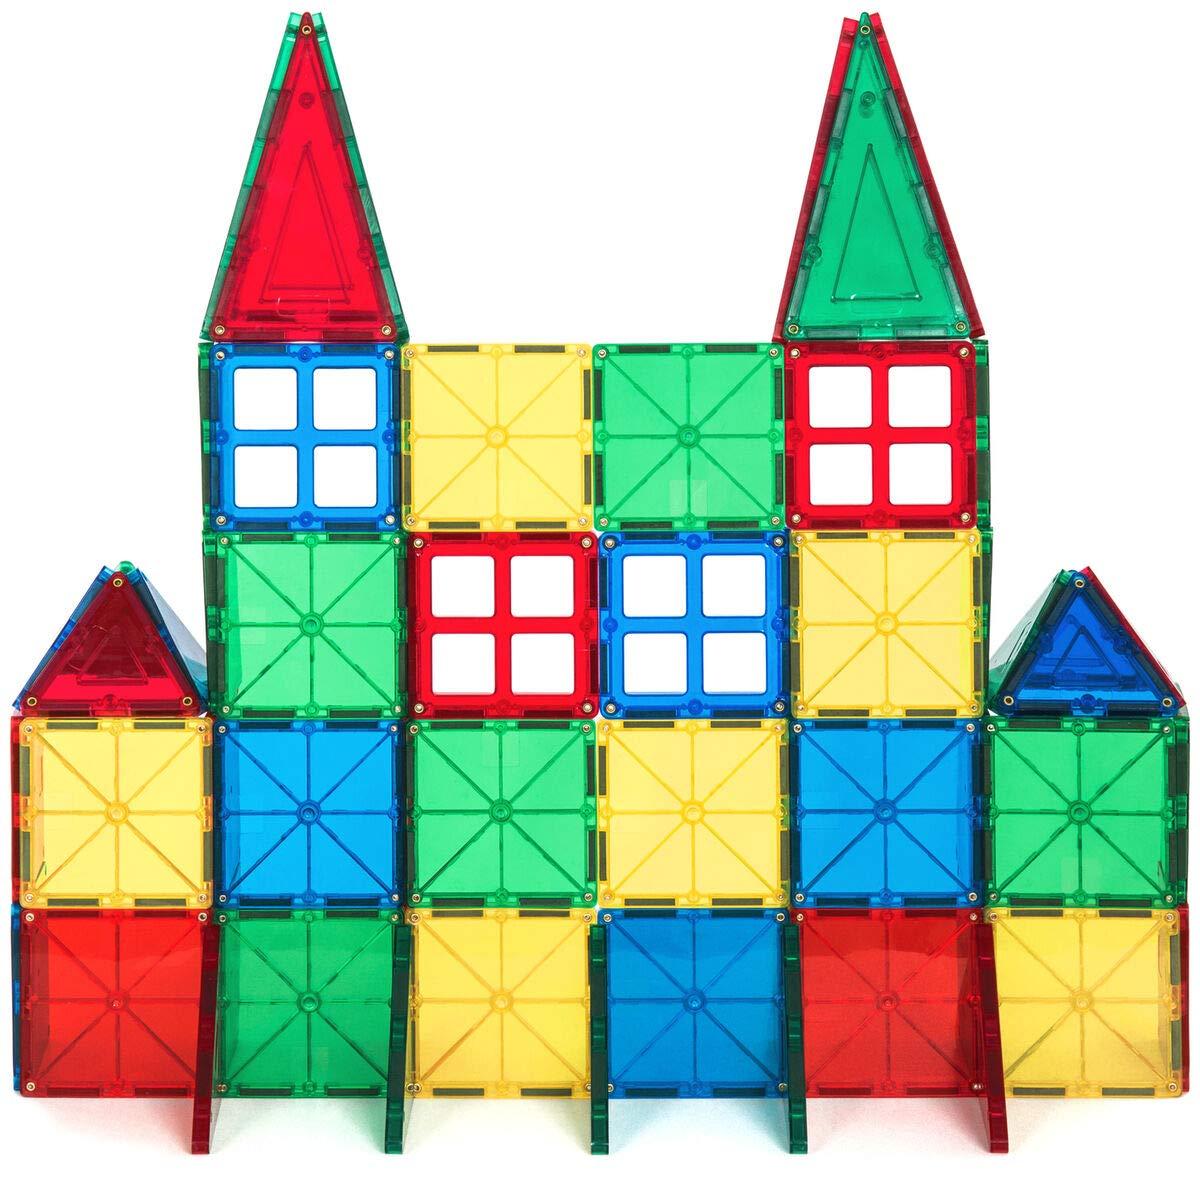 60-Piece Kids Magnetic Building Tiles Toy Set w/ Carrying Case, Best Children's Toys 2019